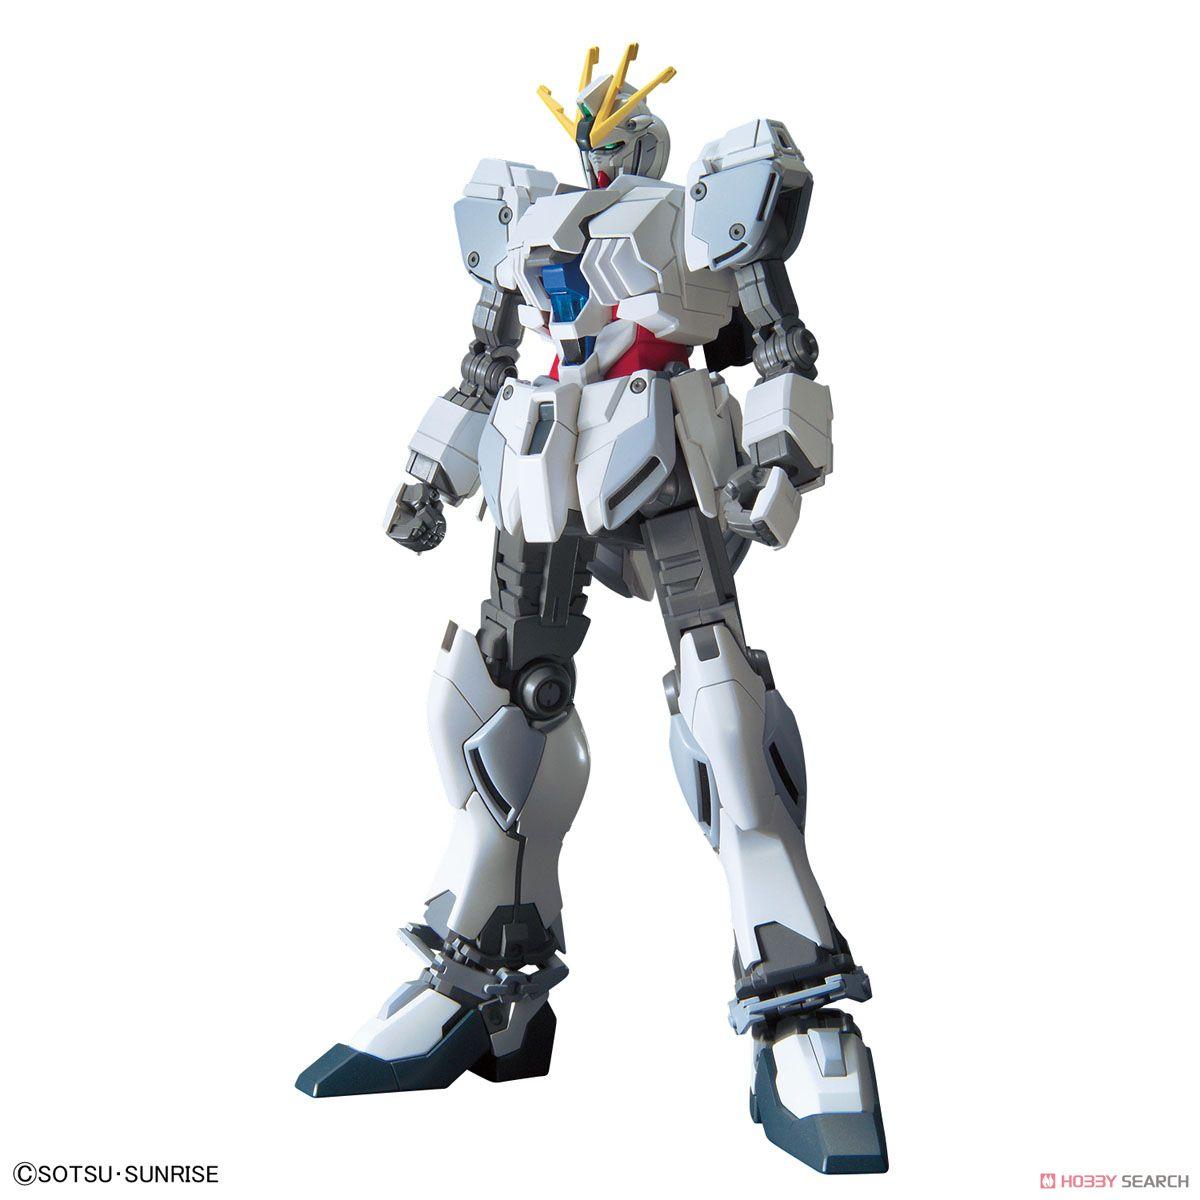 HGUC『ナラティブガンダム A装備』ガンダムNT 1/144 プラモデル-009